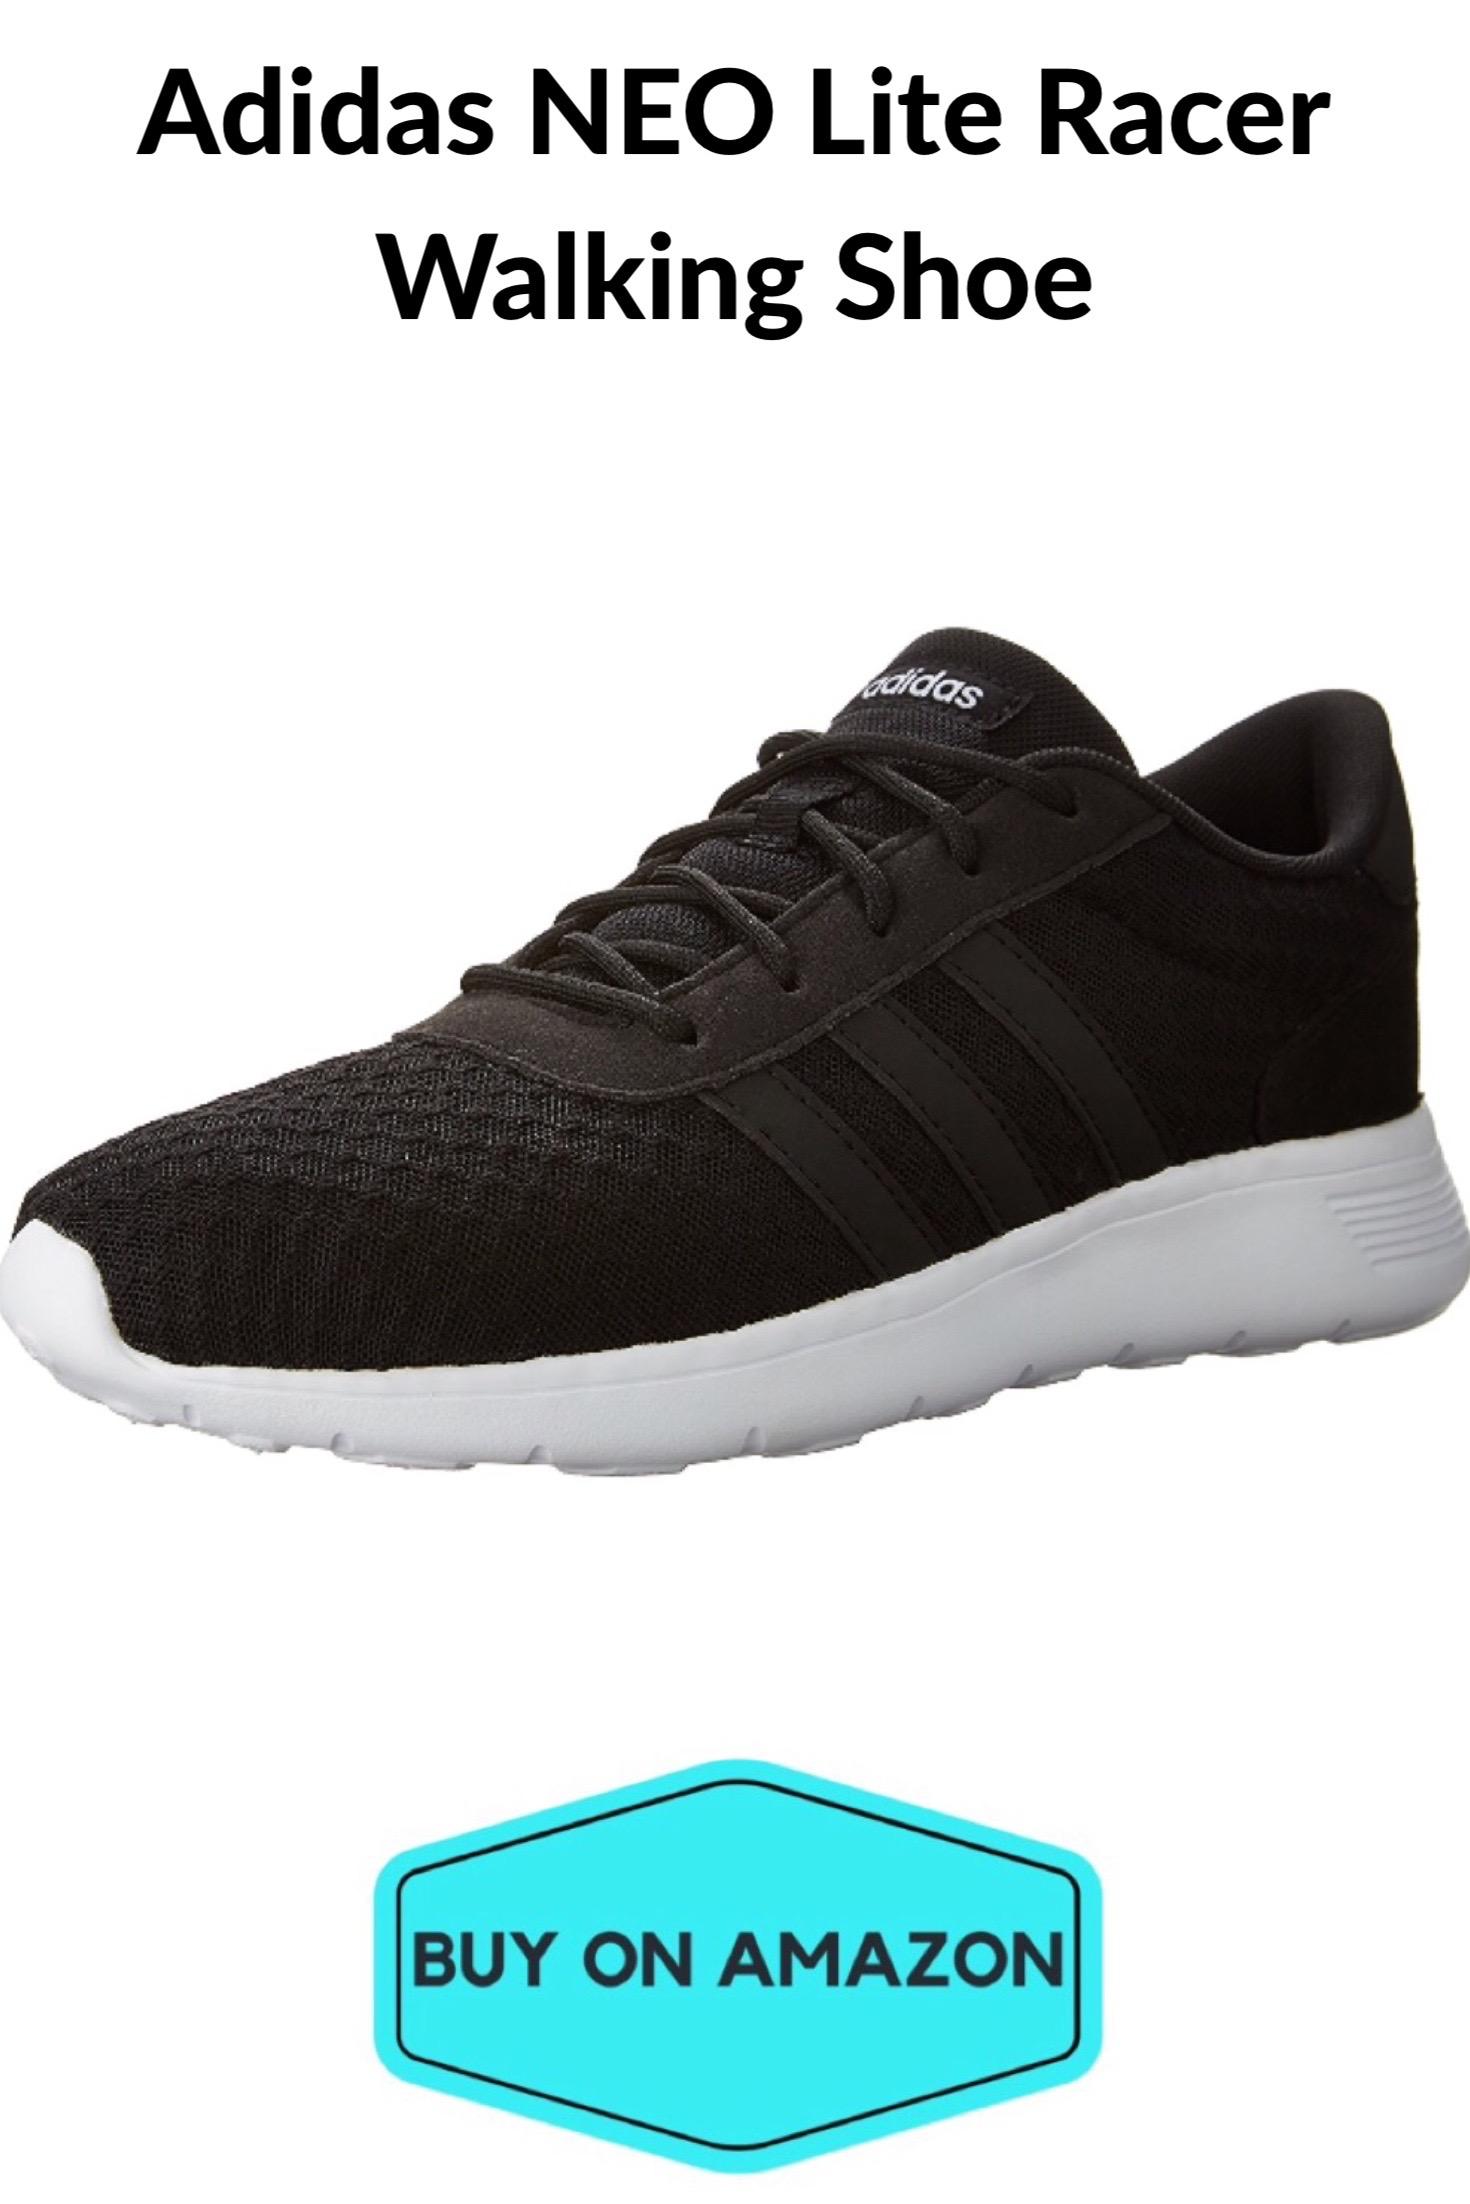 Adidas NEO Lite Racer Women's Walking Shoe